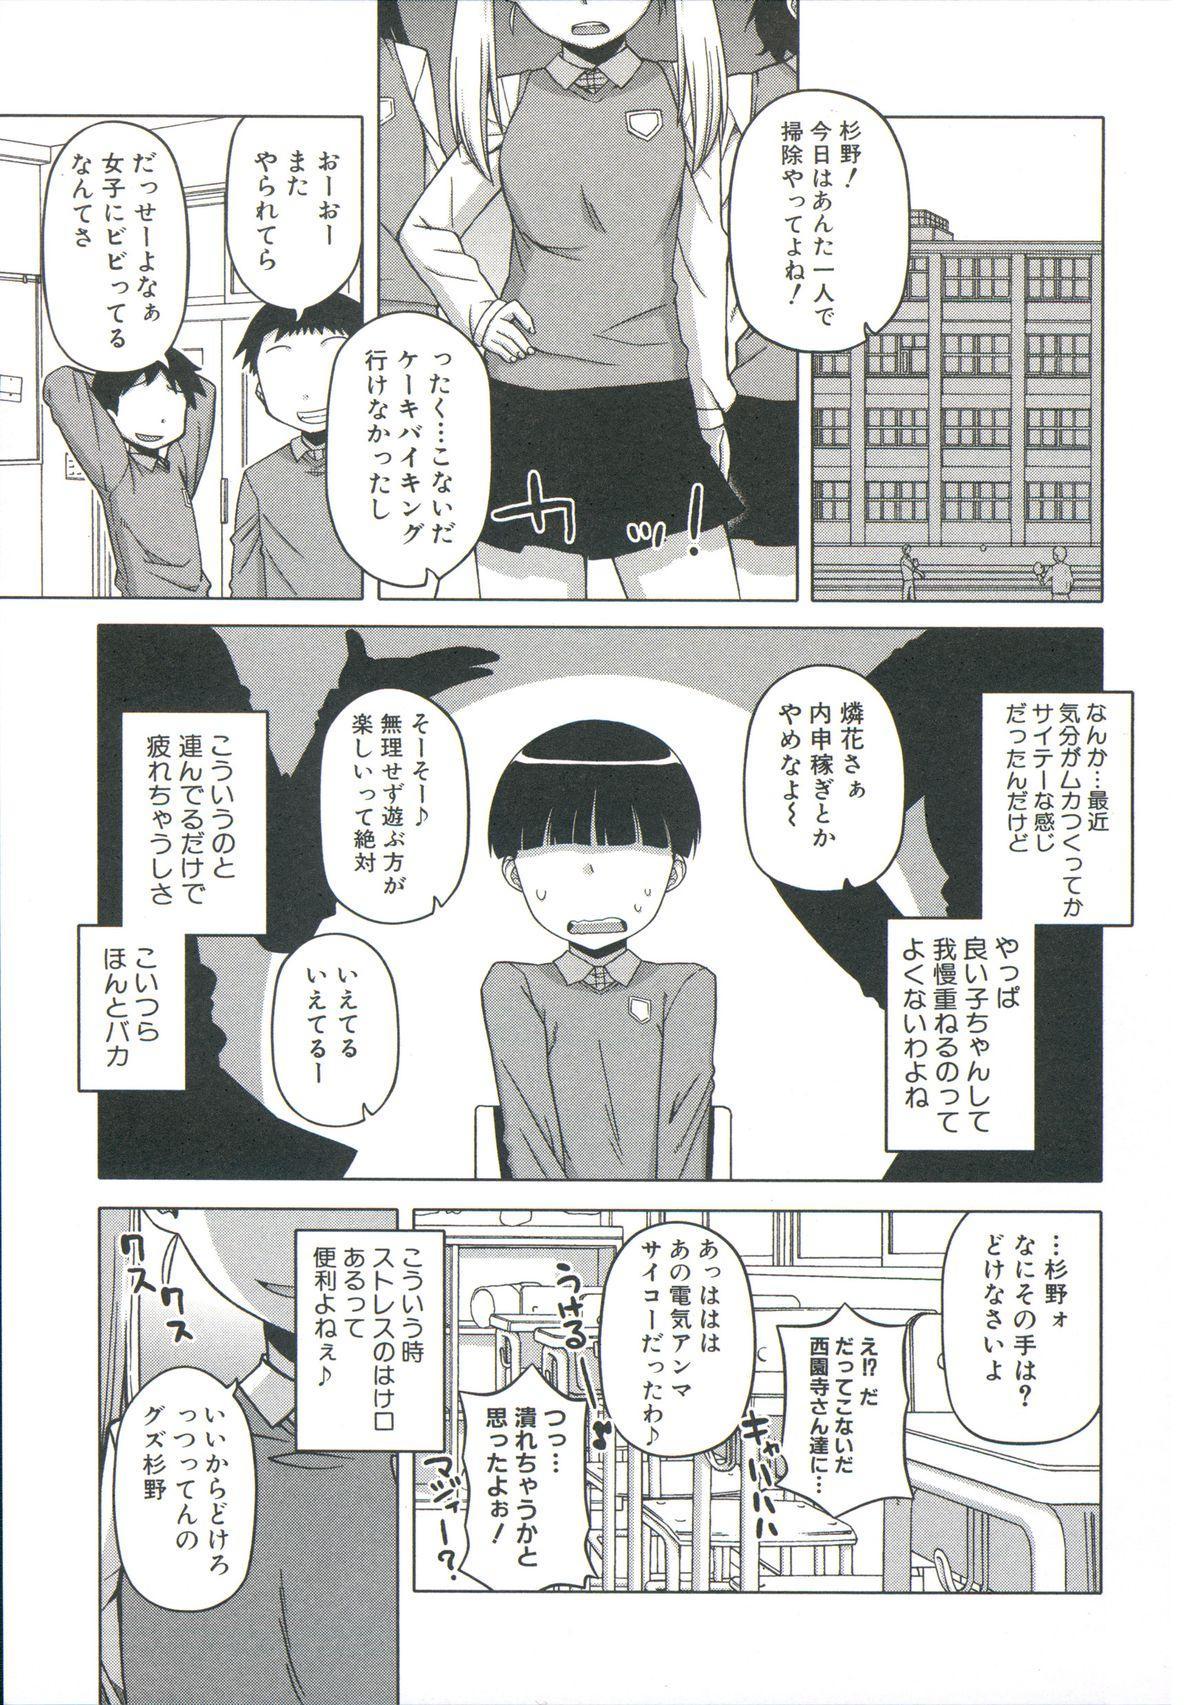 [Takatsu] Ou-sama Appli - King App 133